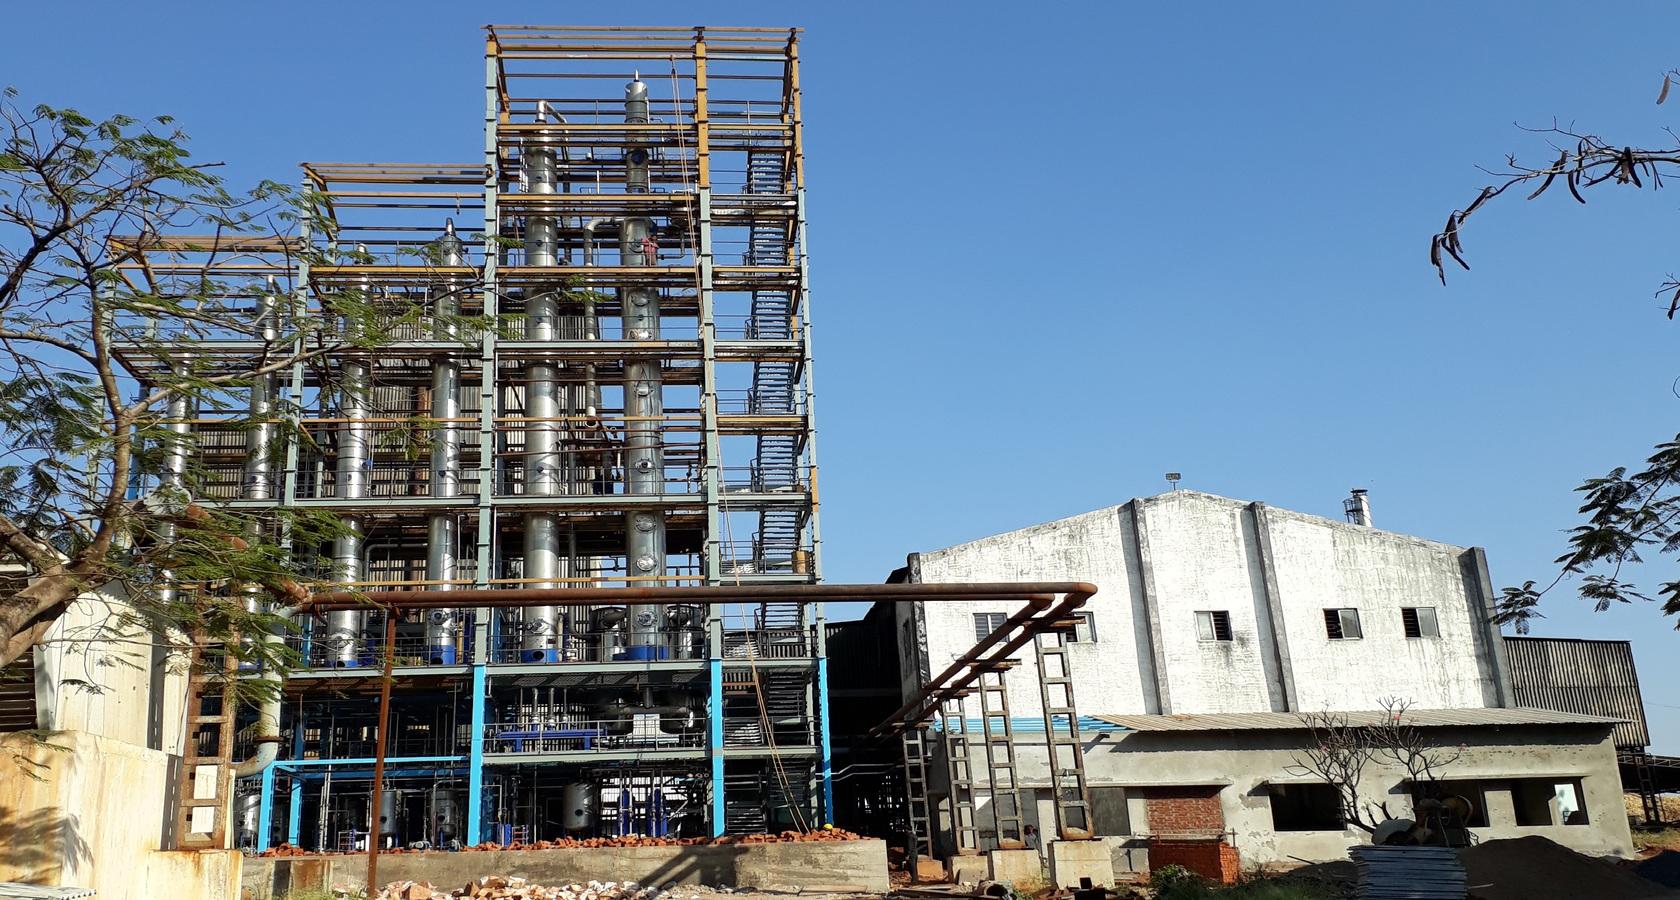 S.S.Ekboote Construction